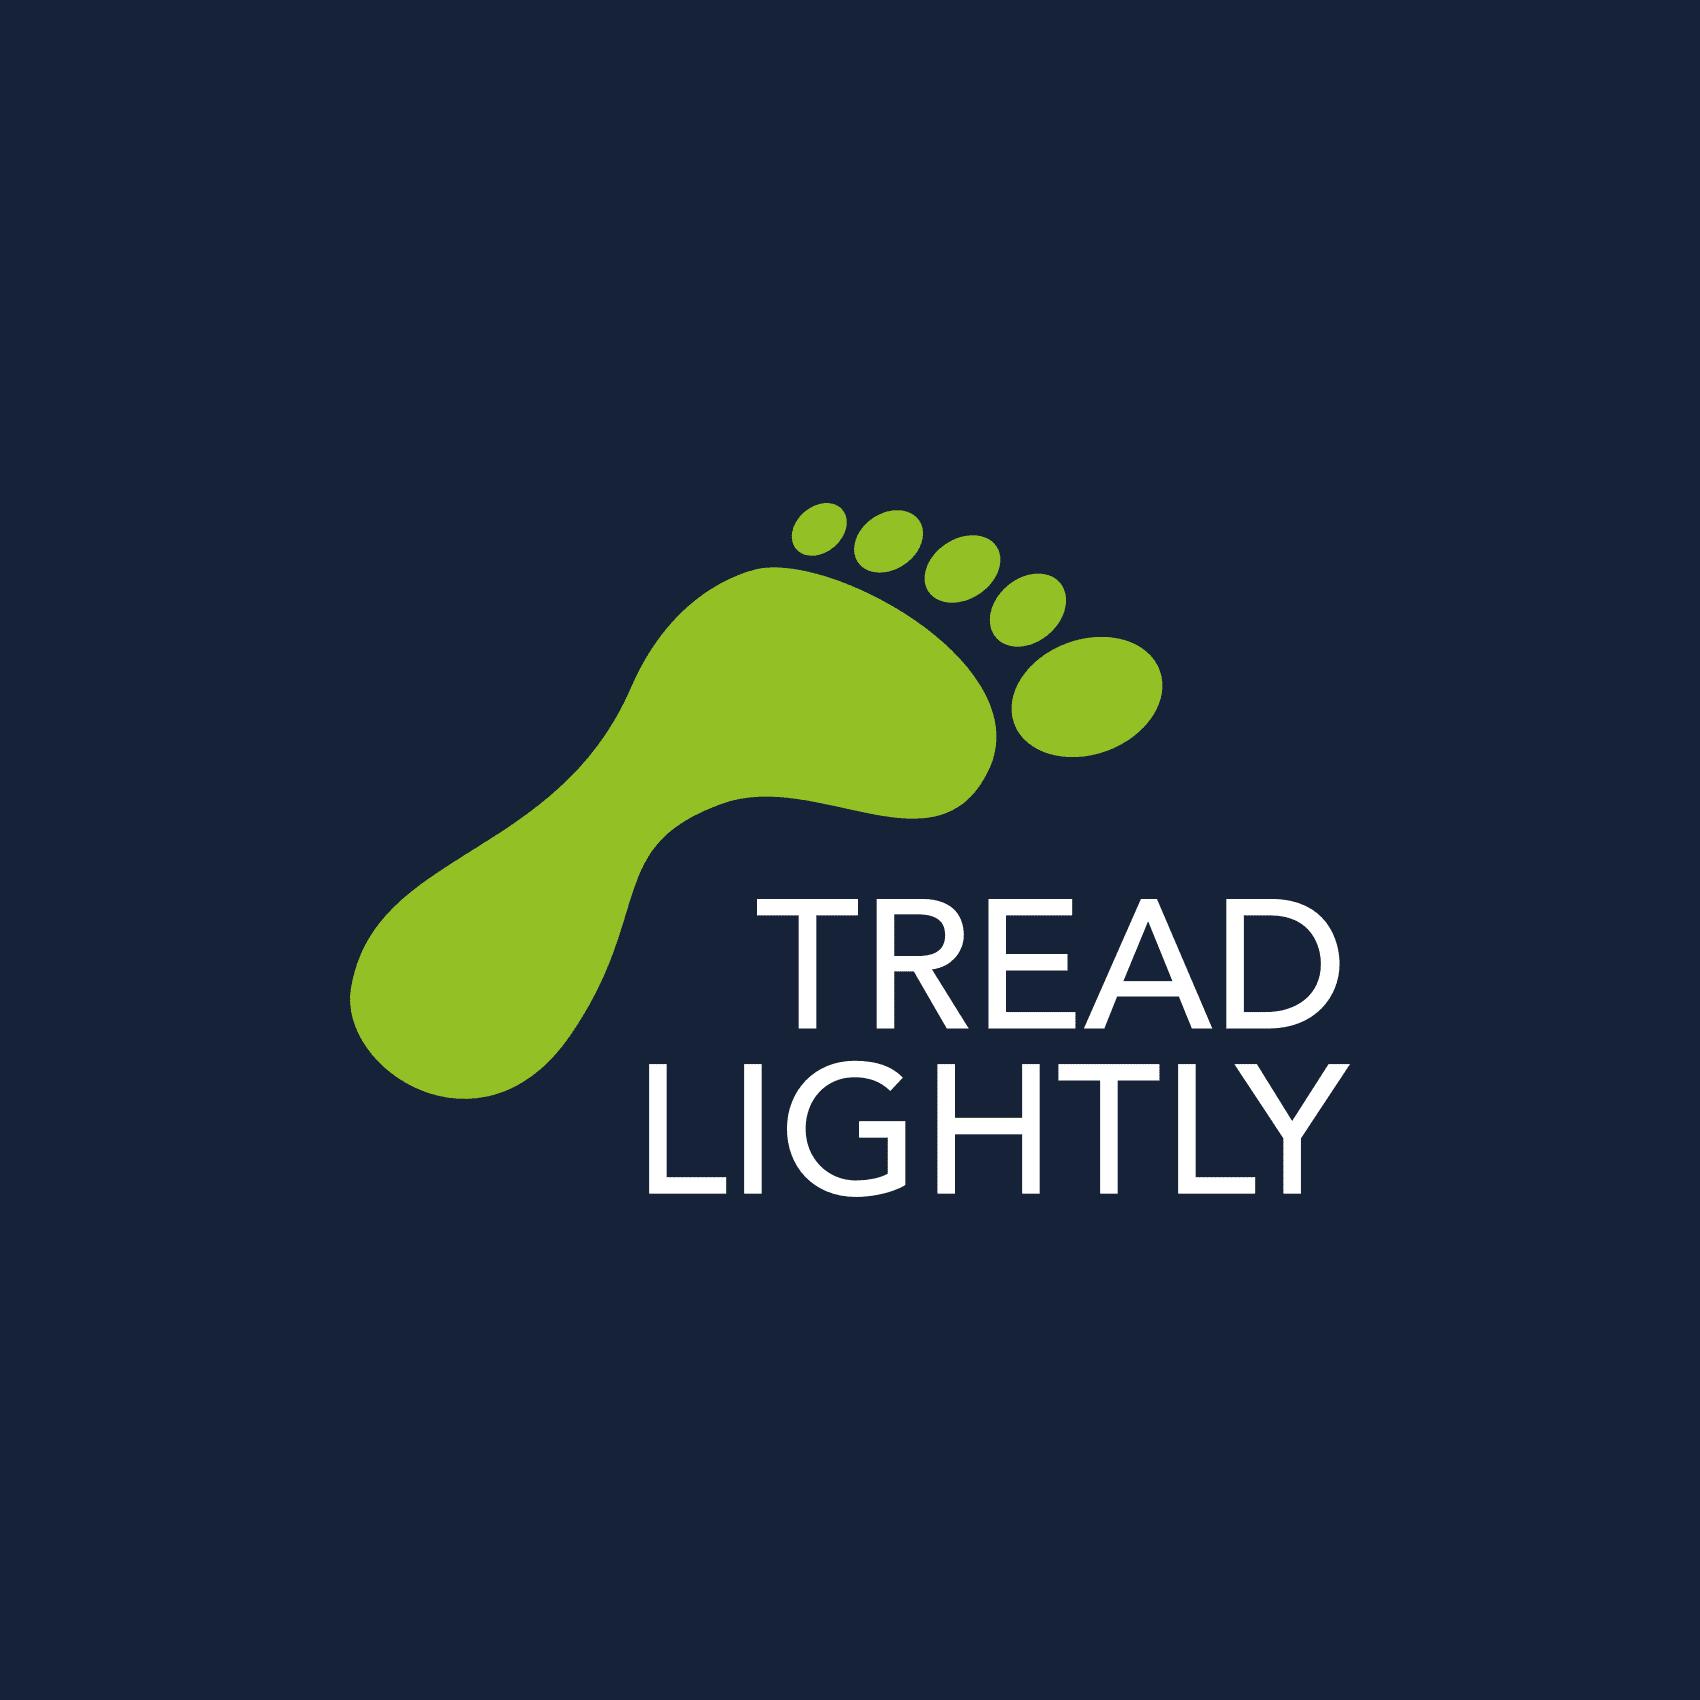 Quadrant Tread Lightly logo